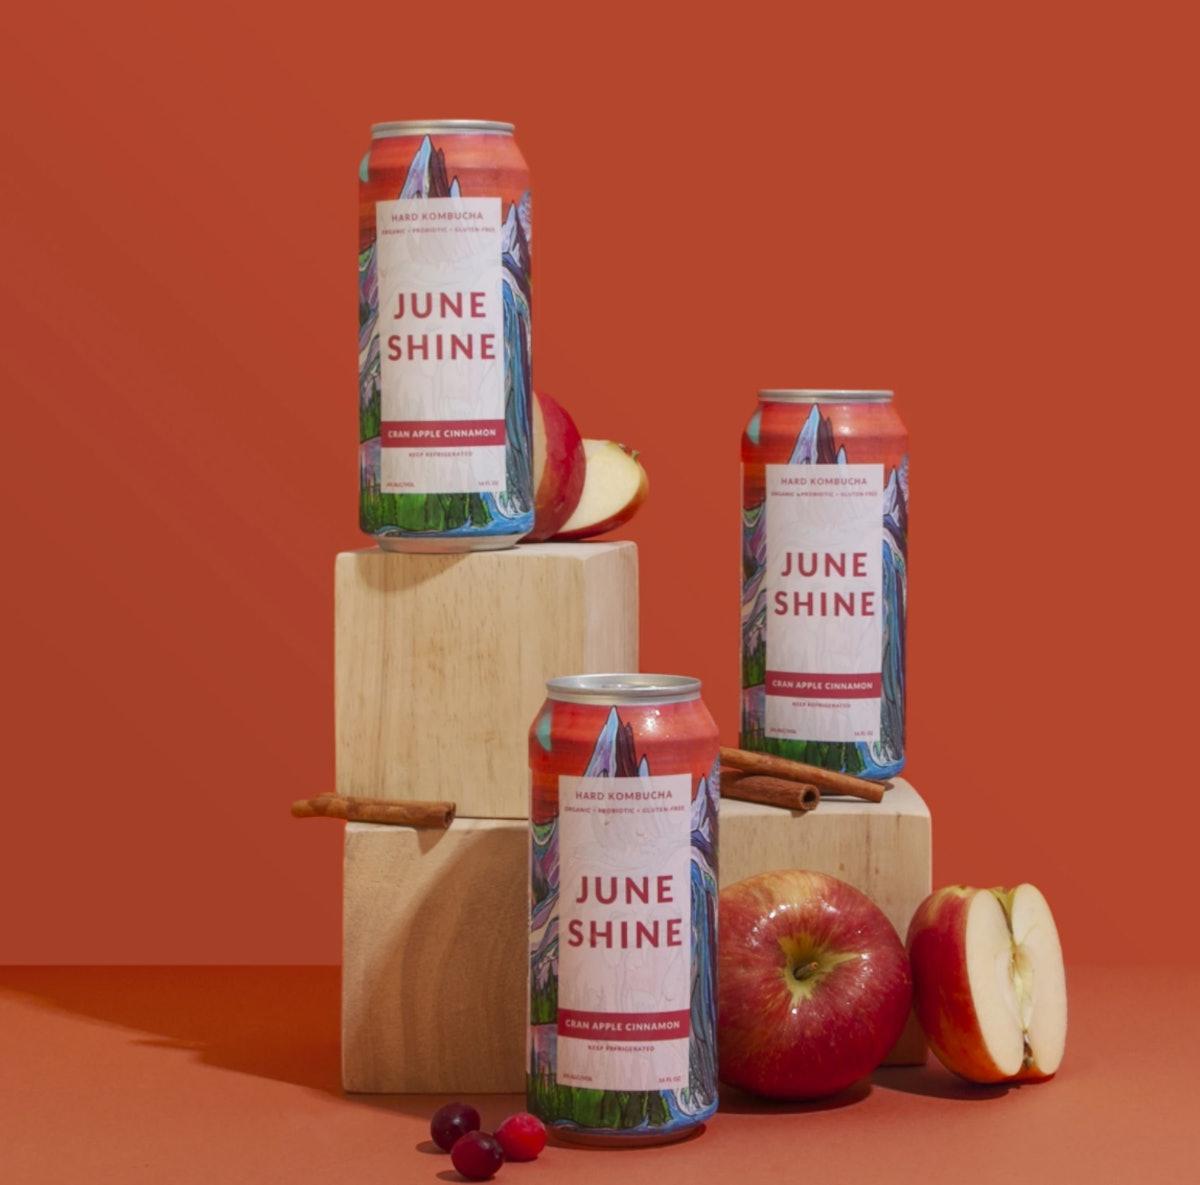 JuneShine Cran Apple Cinnamon